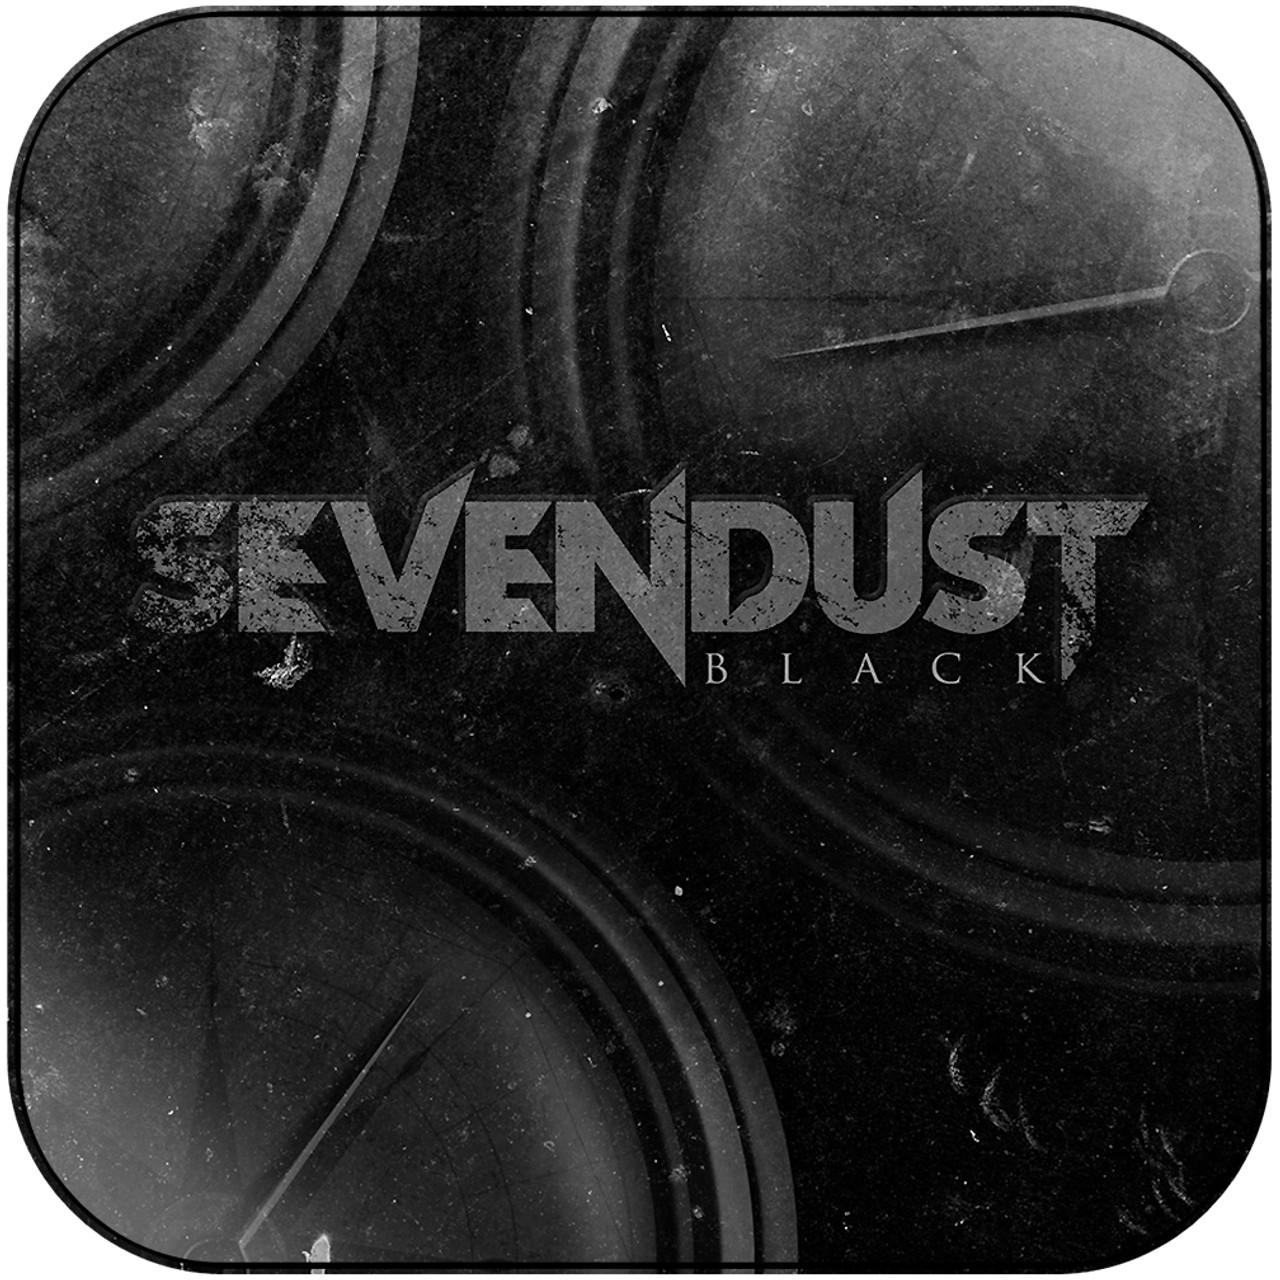 Sevendust - Black Album Cover Sticker